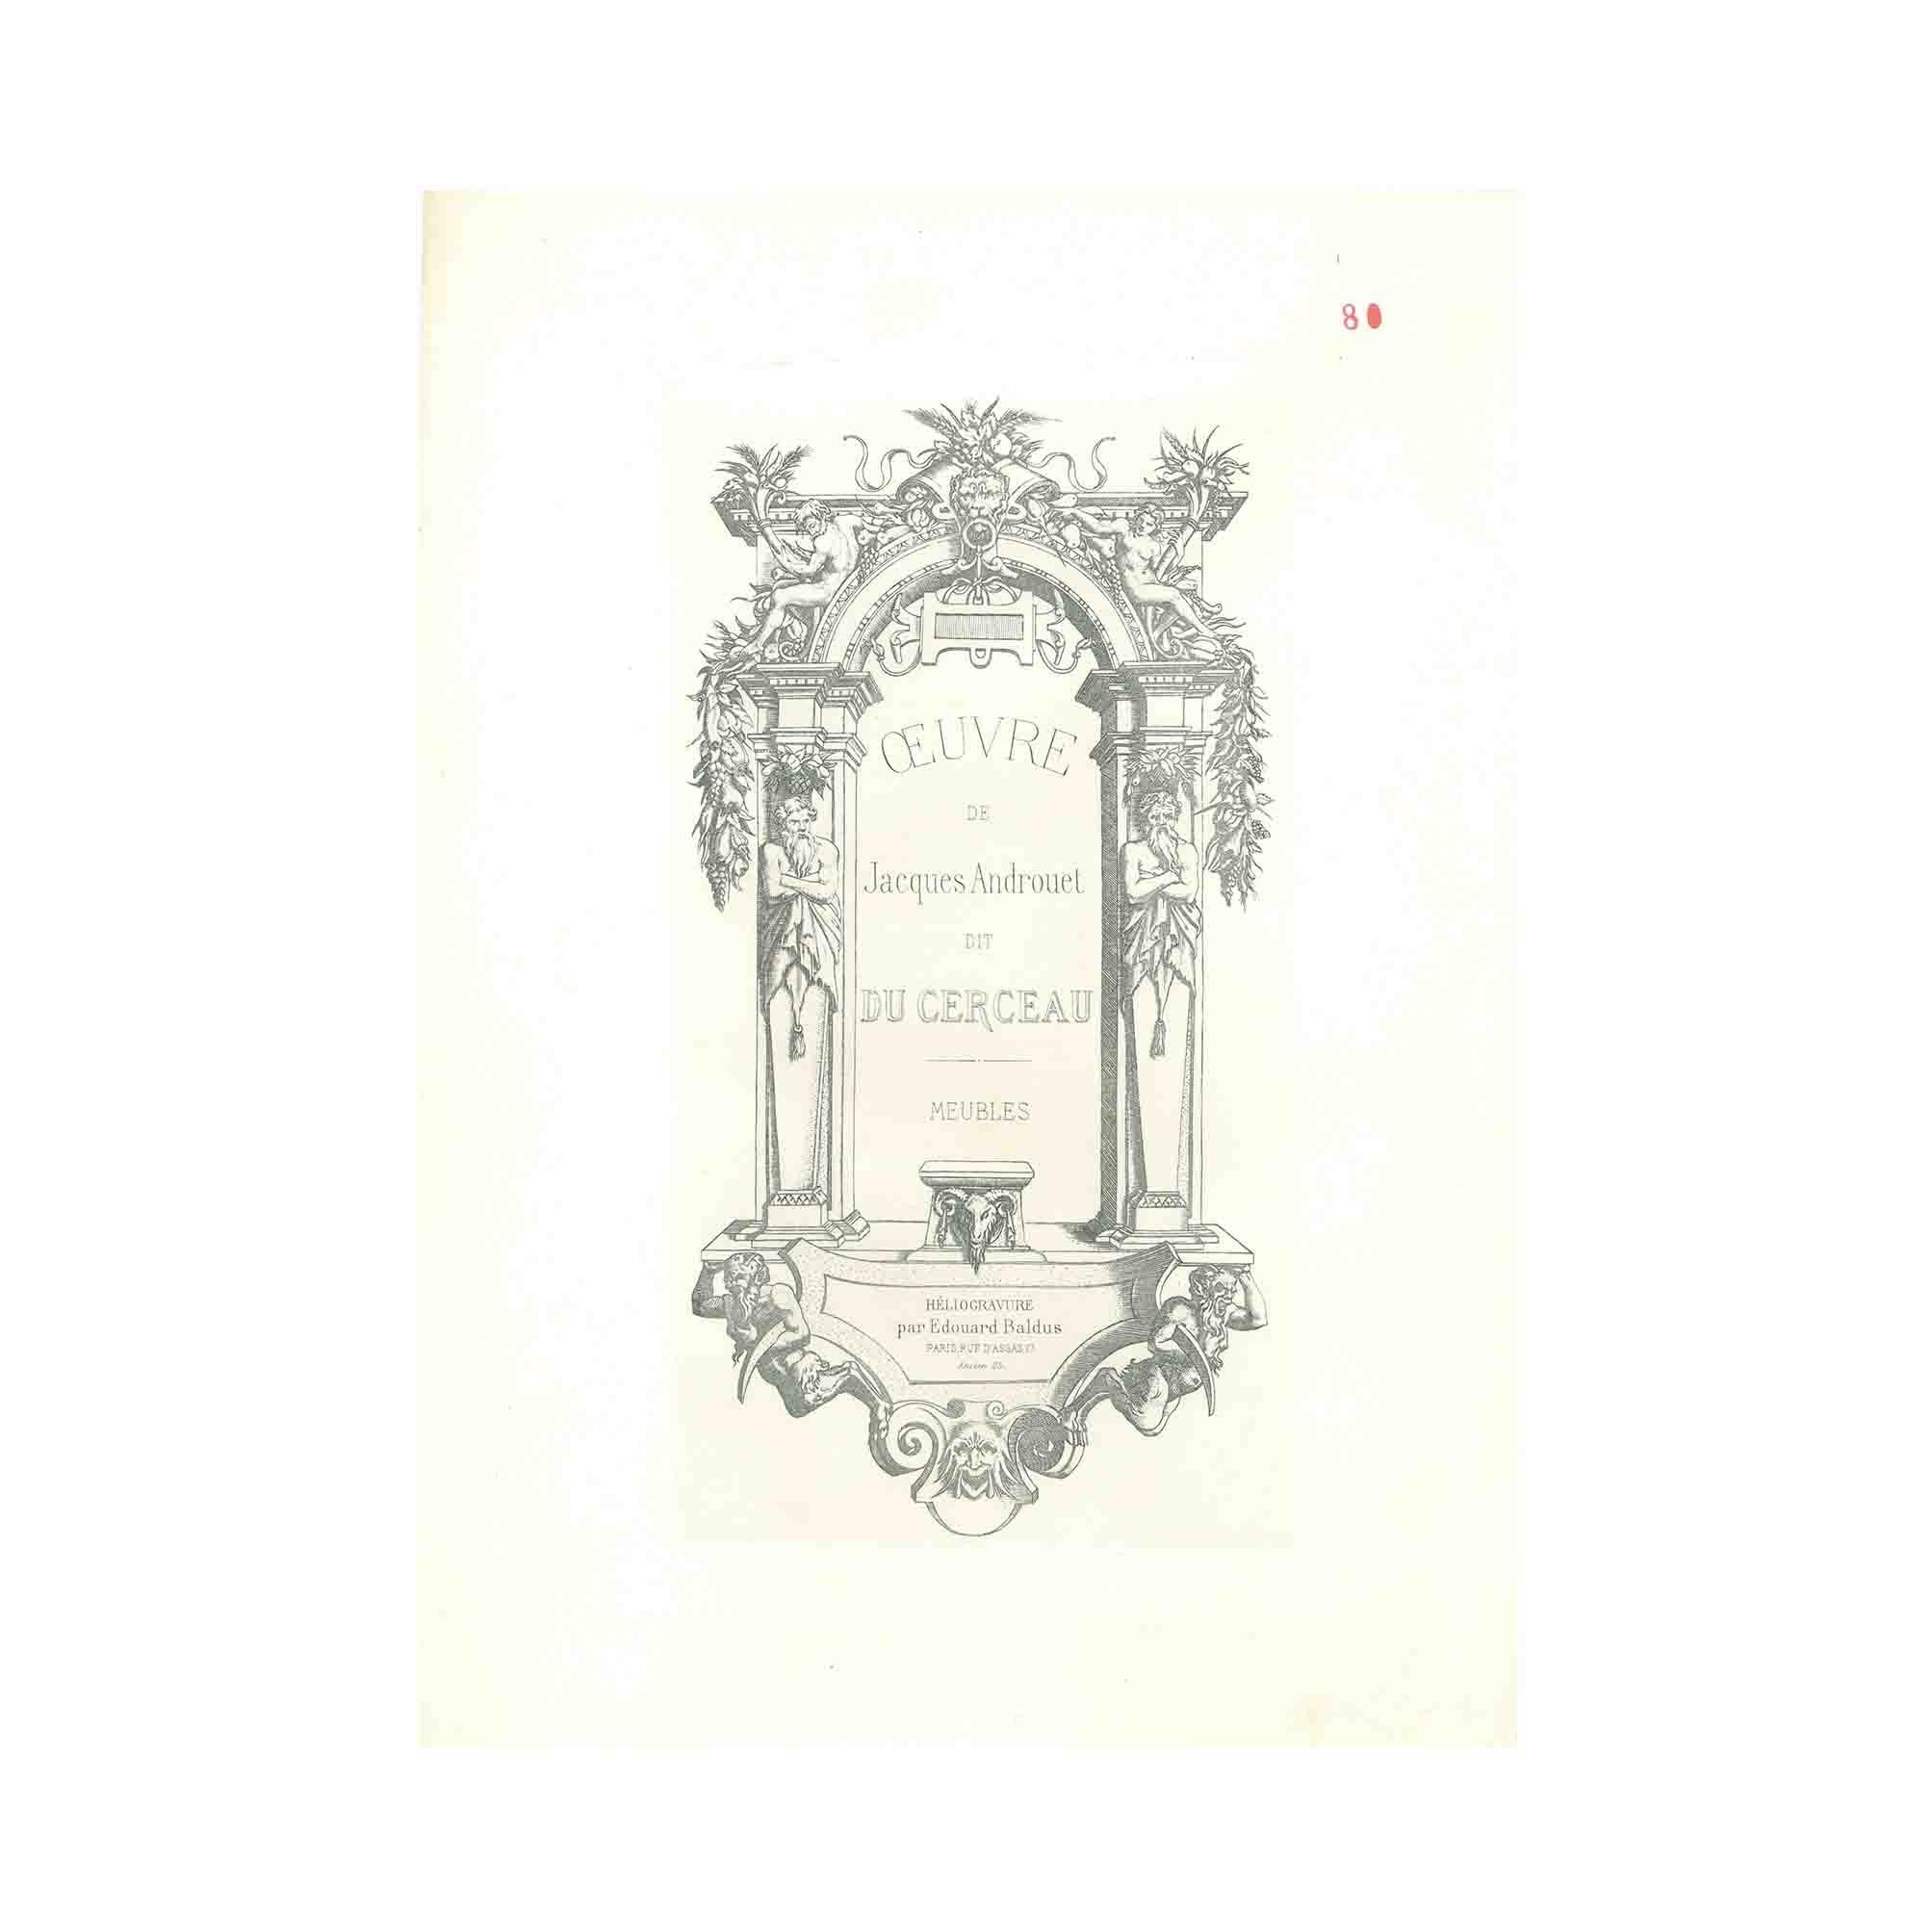 1196K-Baldus-Cerceau-Meubles-1869-1-N.jpg